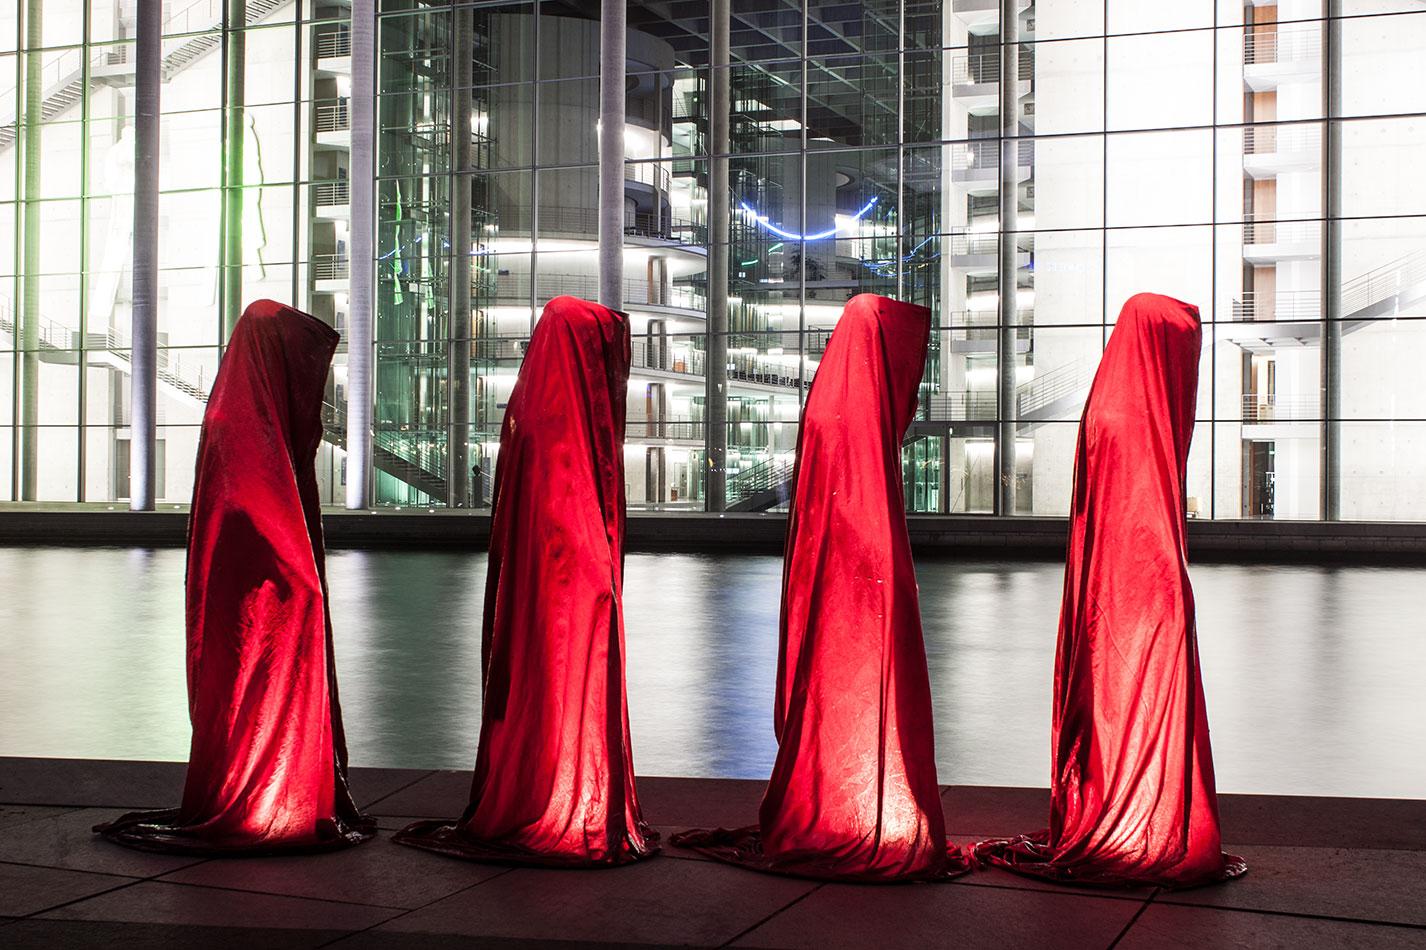 25-years-wallfall-berlin-germany-contemporary-fine-art-show-arts-design-sculpture-public-arts-arte-antique-guardians-of-time-manfred-kili-kielnhofer-4695